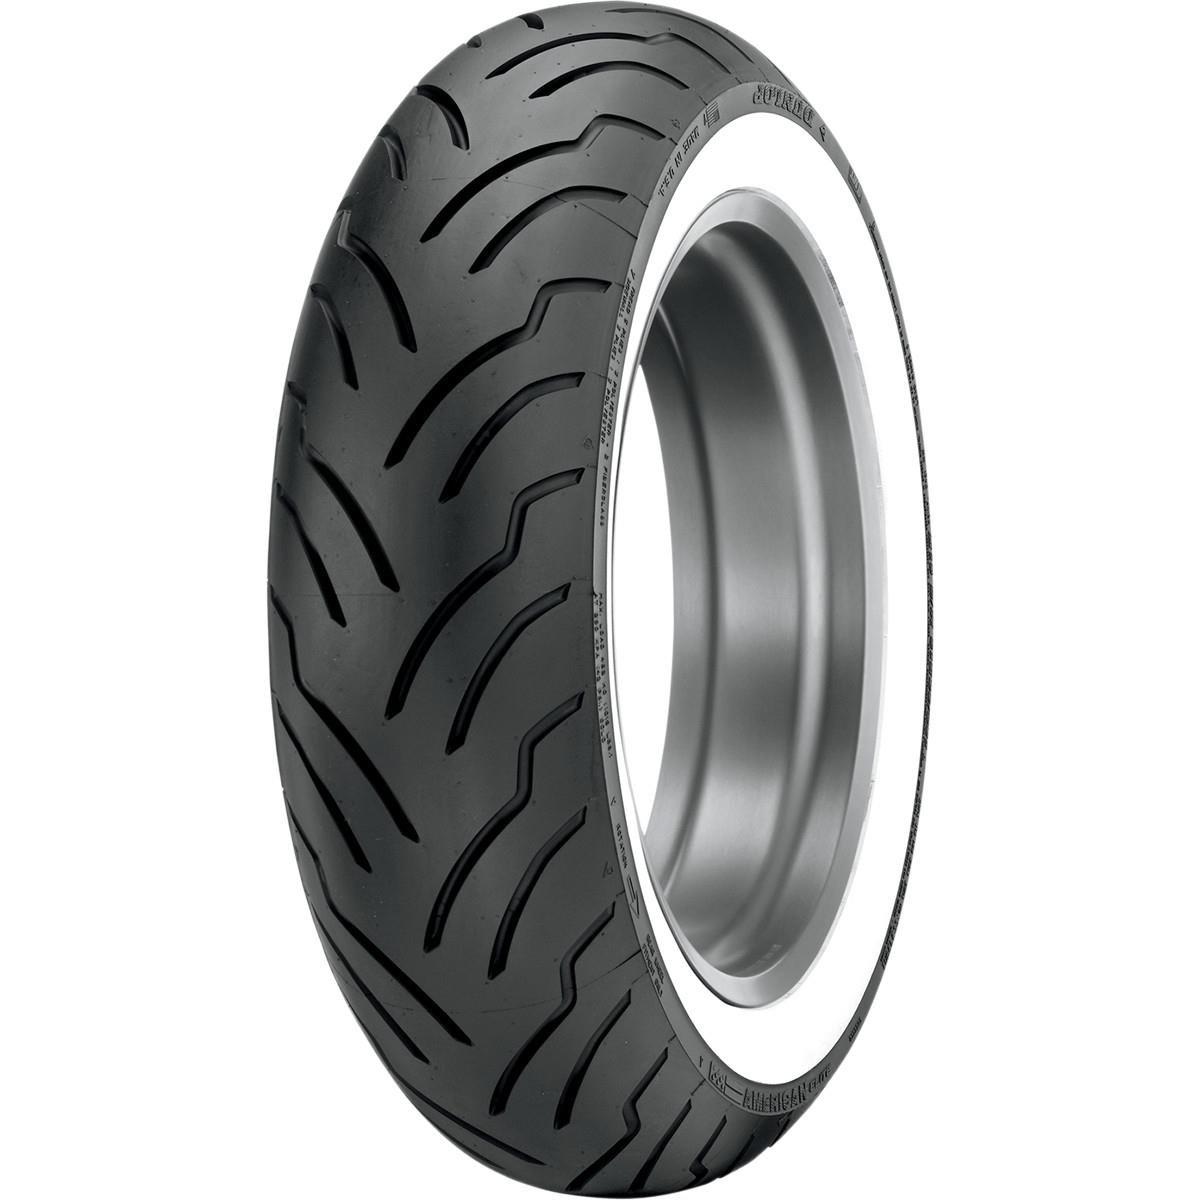 Dunlop Tires American Elite HD Touring Tire - Rear - MT90B16 - Wide Whitewall , Position: Rear, Rim Size: 16, Tire Application: Touring, Tire Size: MT90-16, Tire Type: Street, Tire Construction: Bias